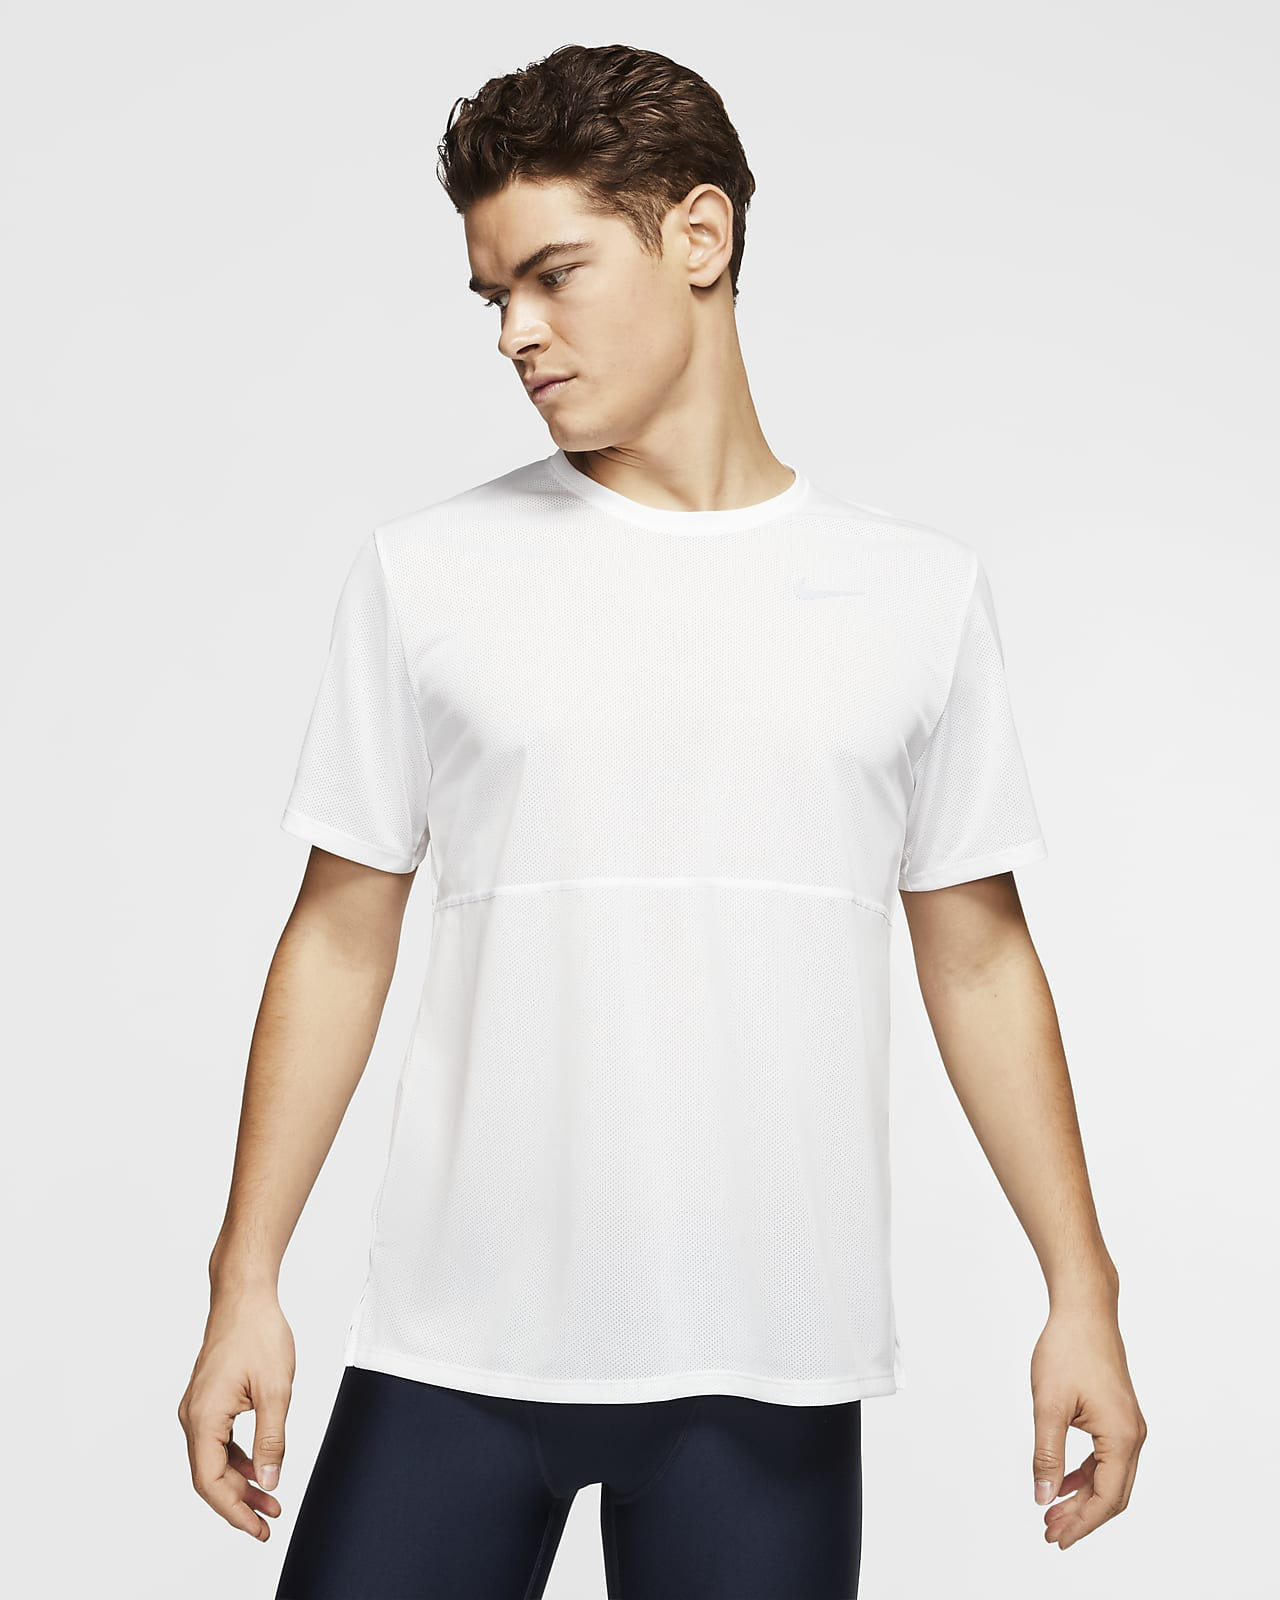 Camisola de running Nike Breathe para homem